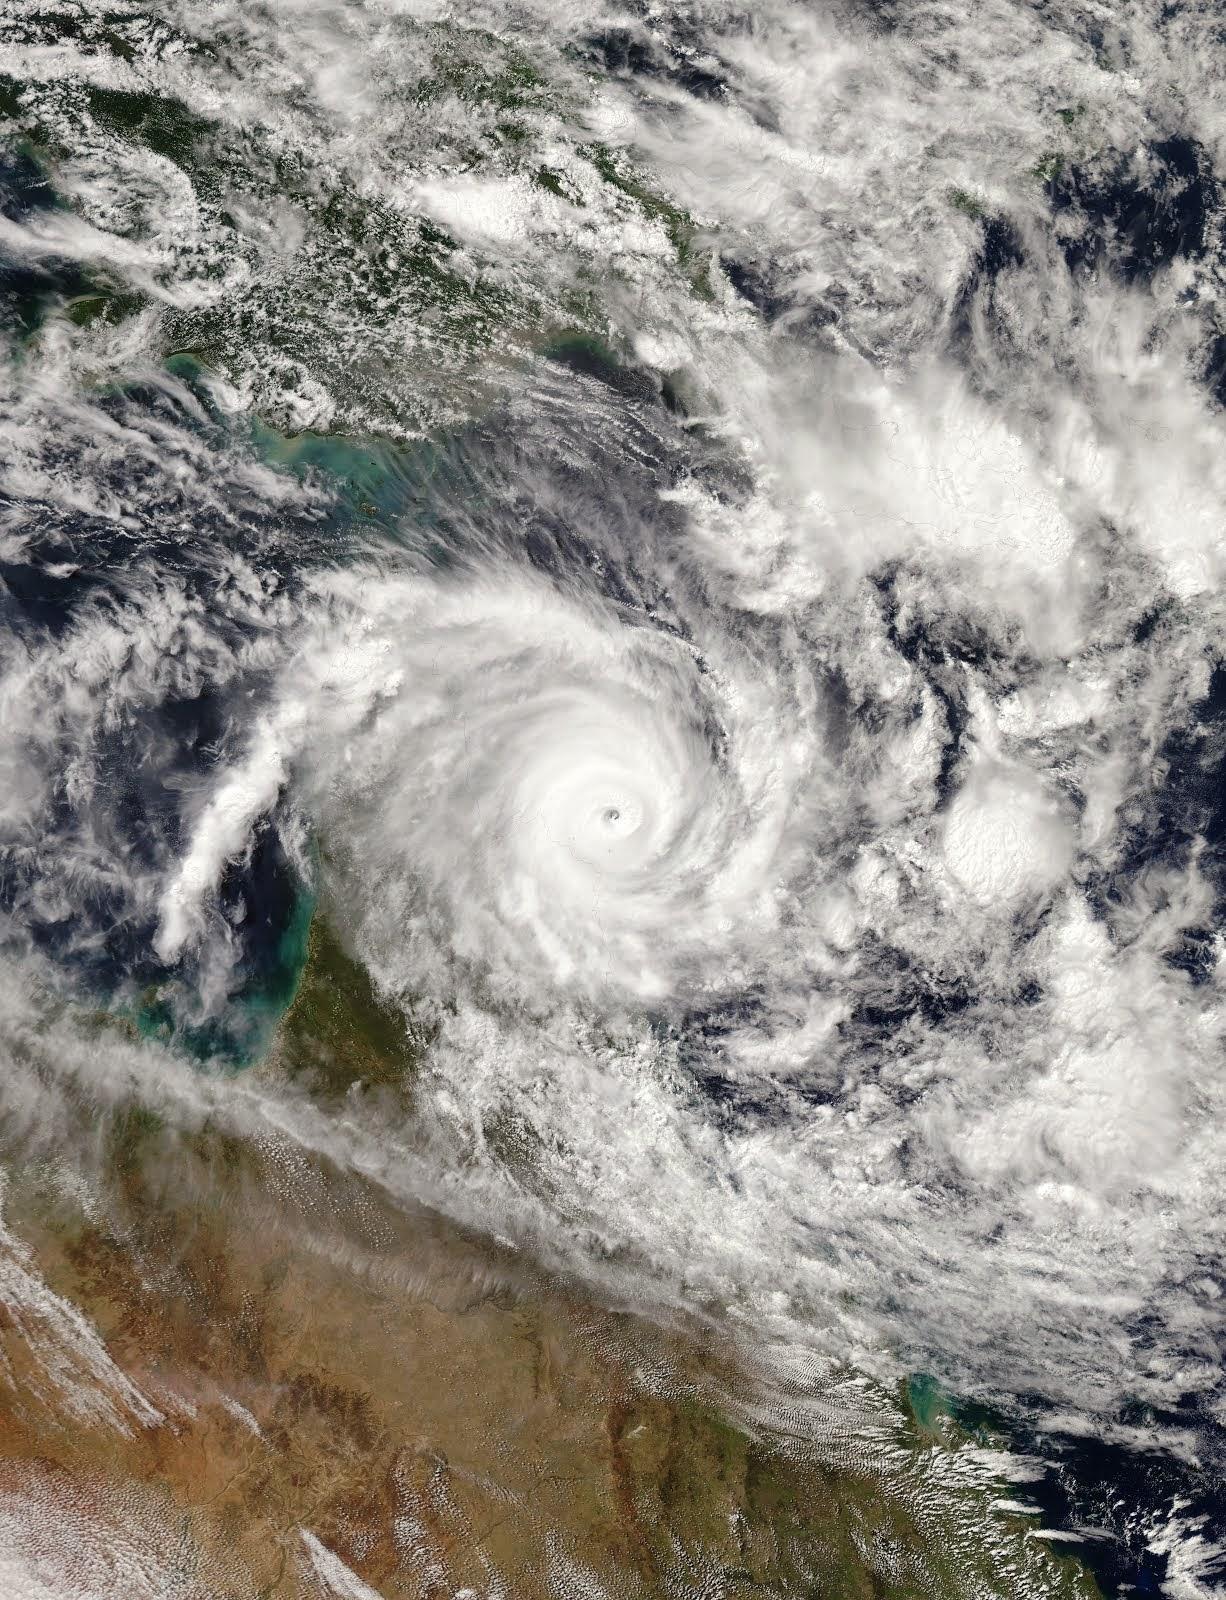 CYCLONE ITA MAKES LANDFALL IN QUEENSLAND, AUSTRALIA